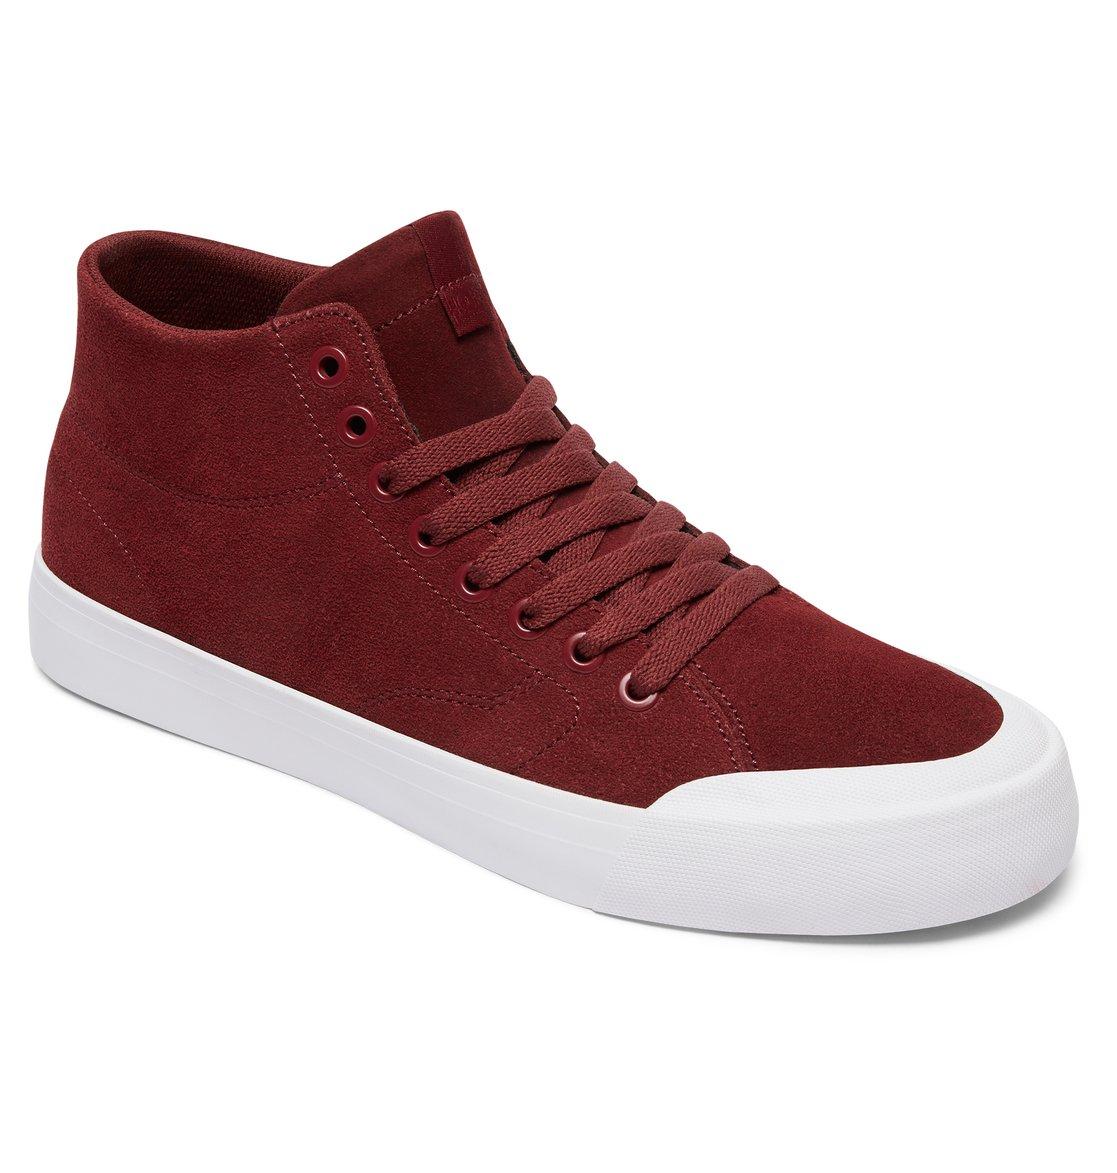 87efc17c76c DC Shoes™ Men s Evan Smith Hi Zero High Top Shoes ADYS300423